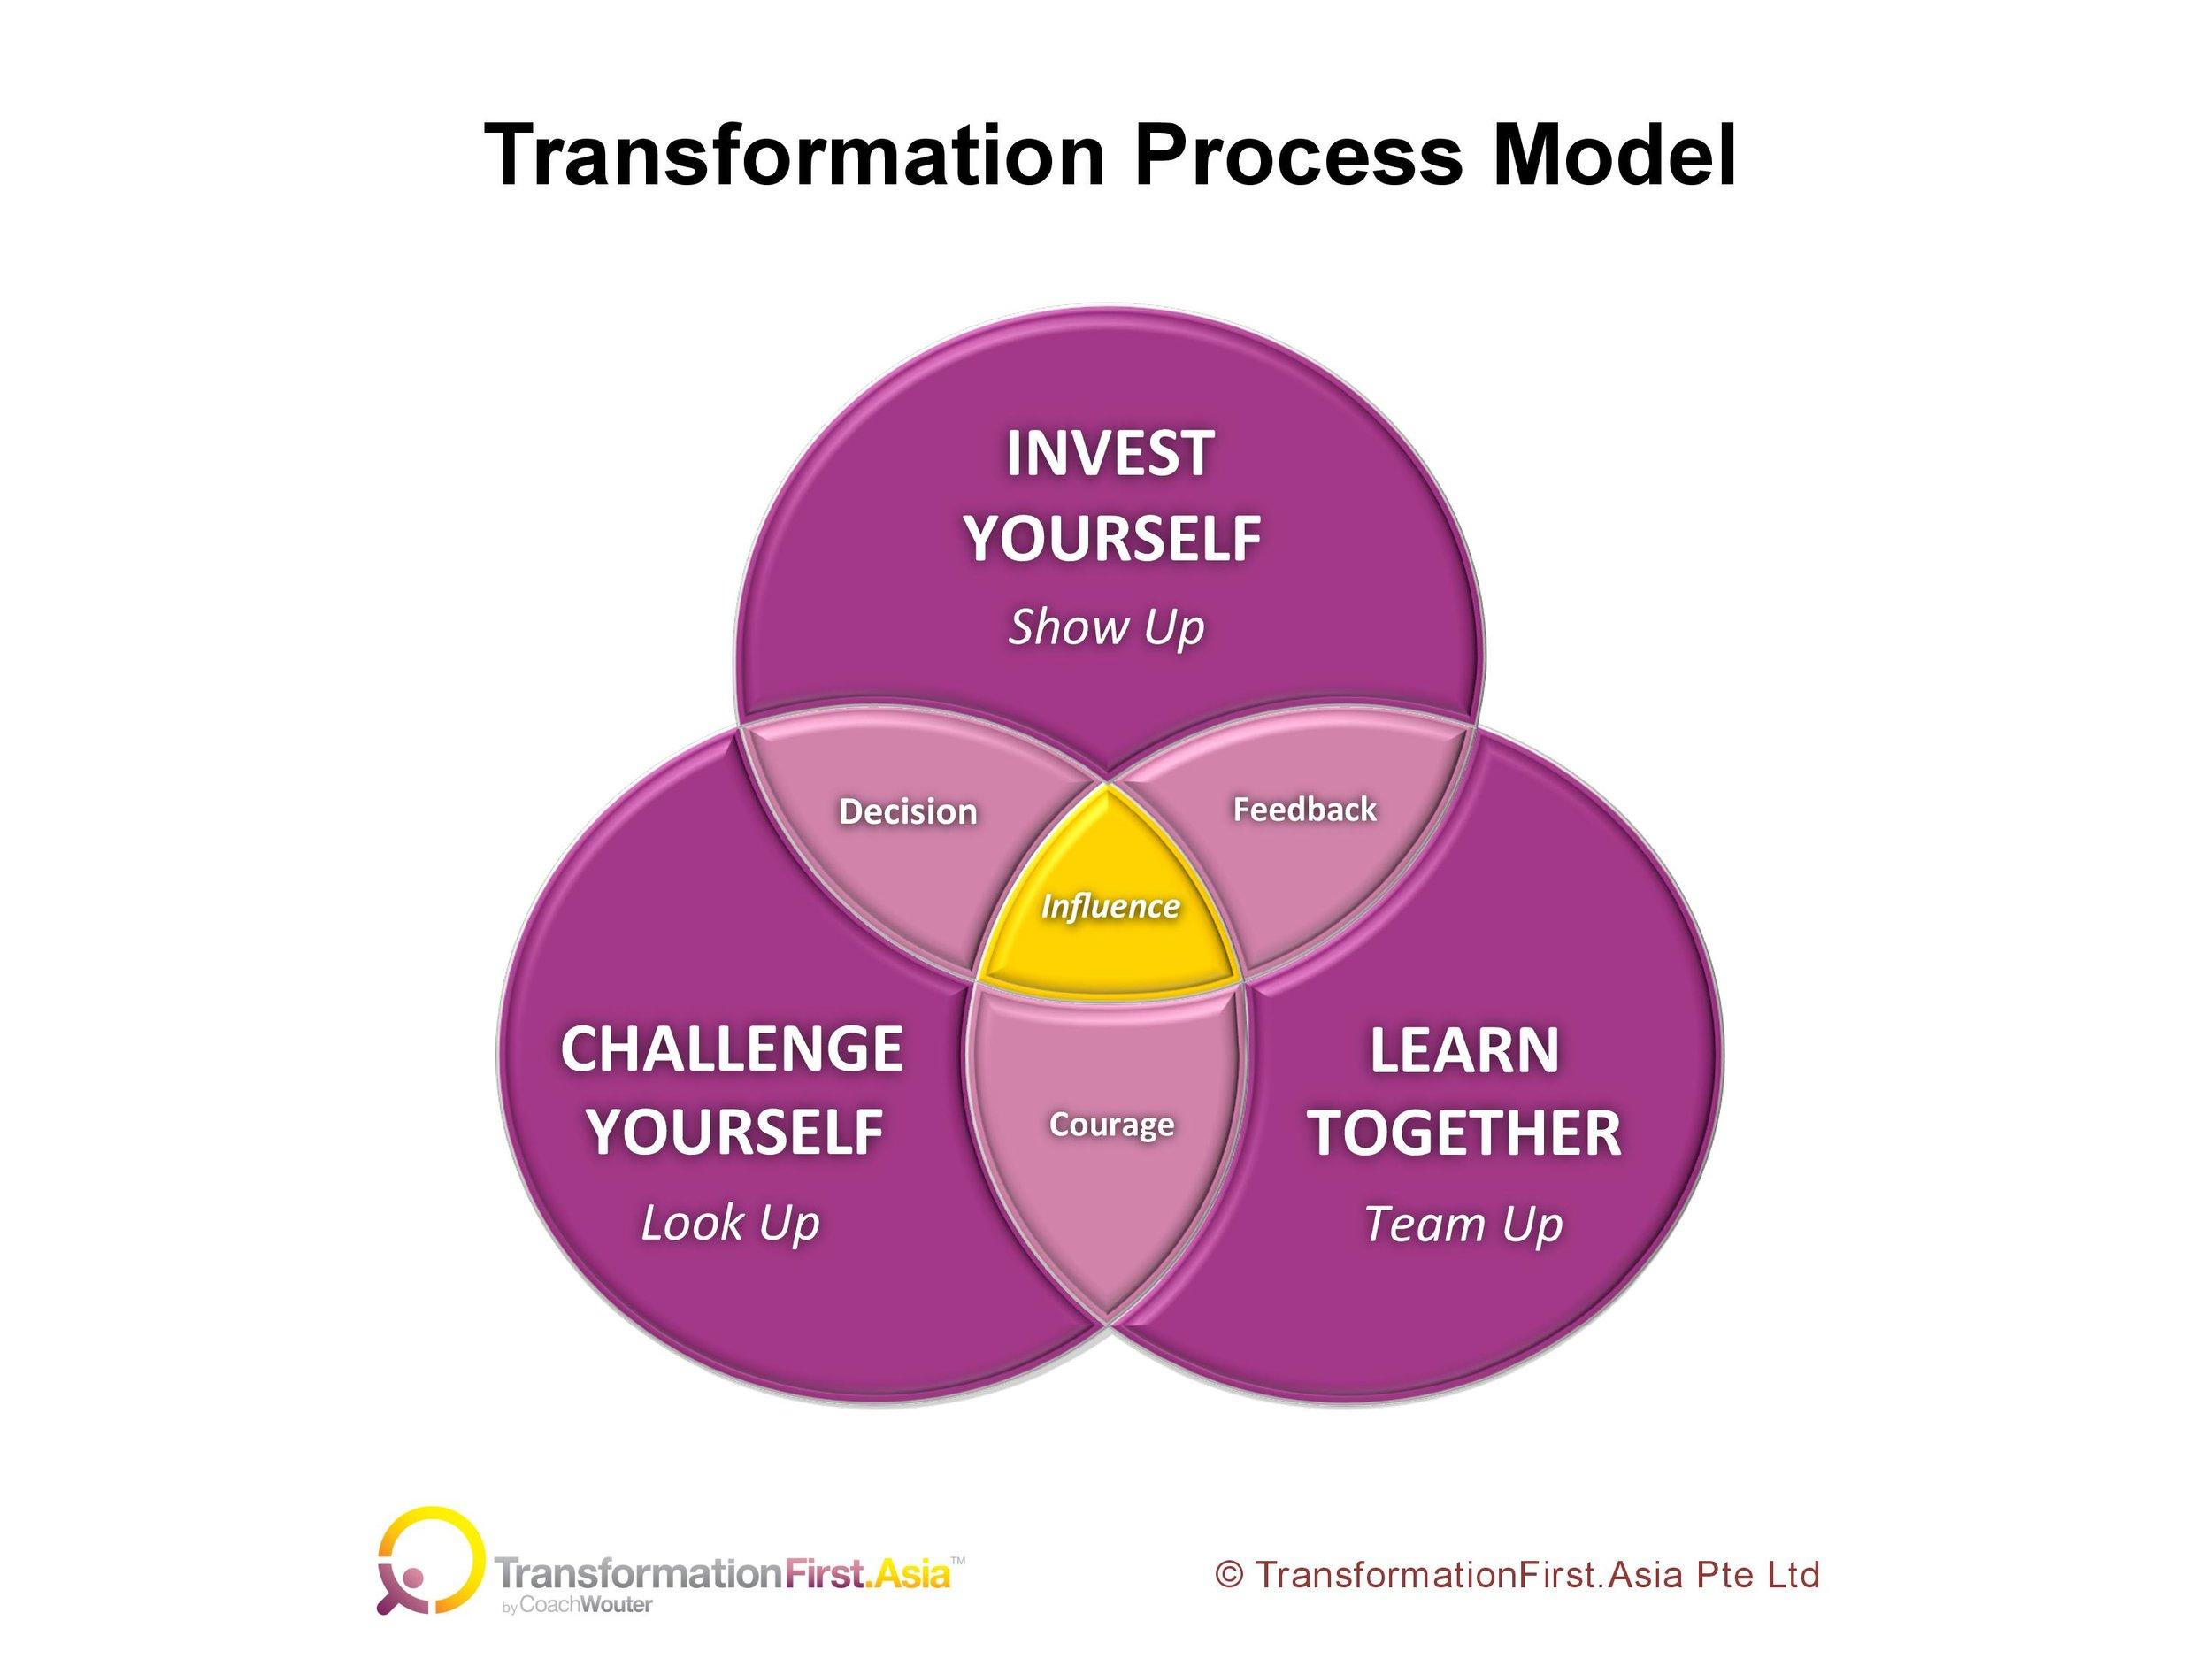 Transformation Process Model 25 Oct 2017-page-002.jpg